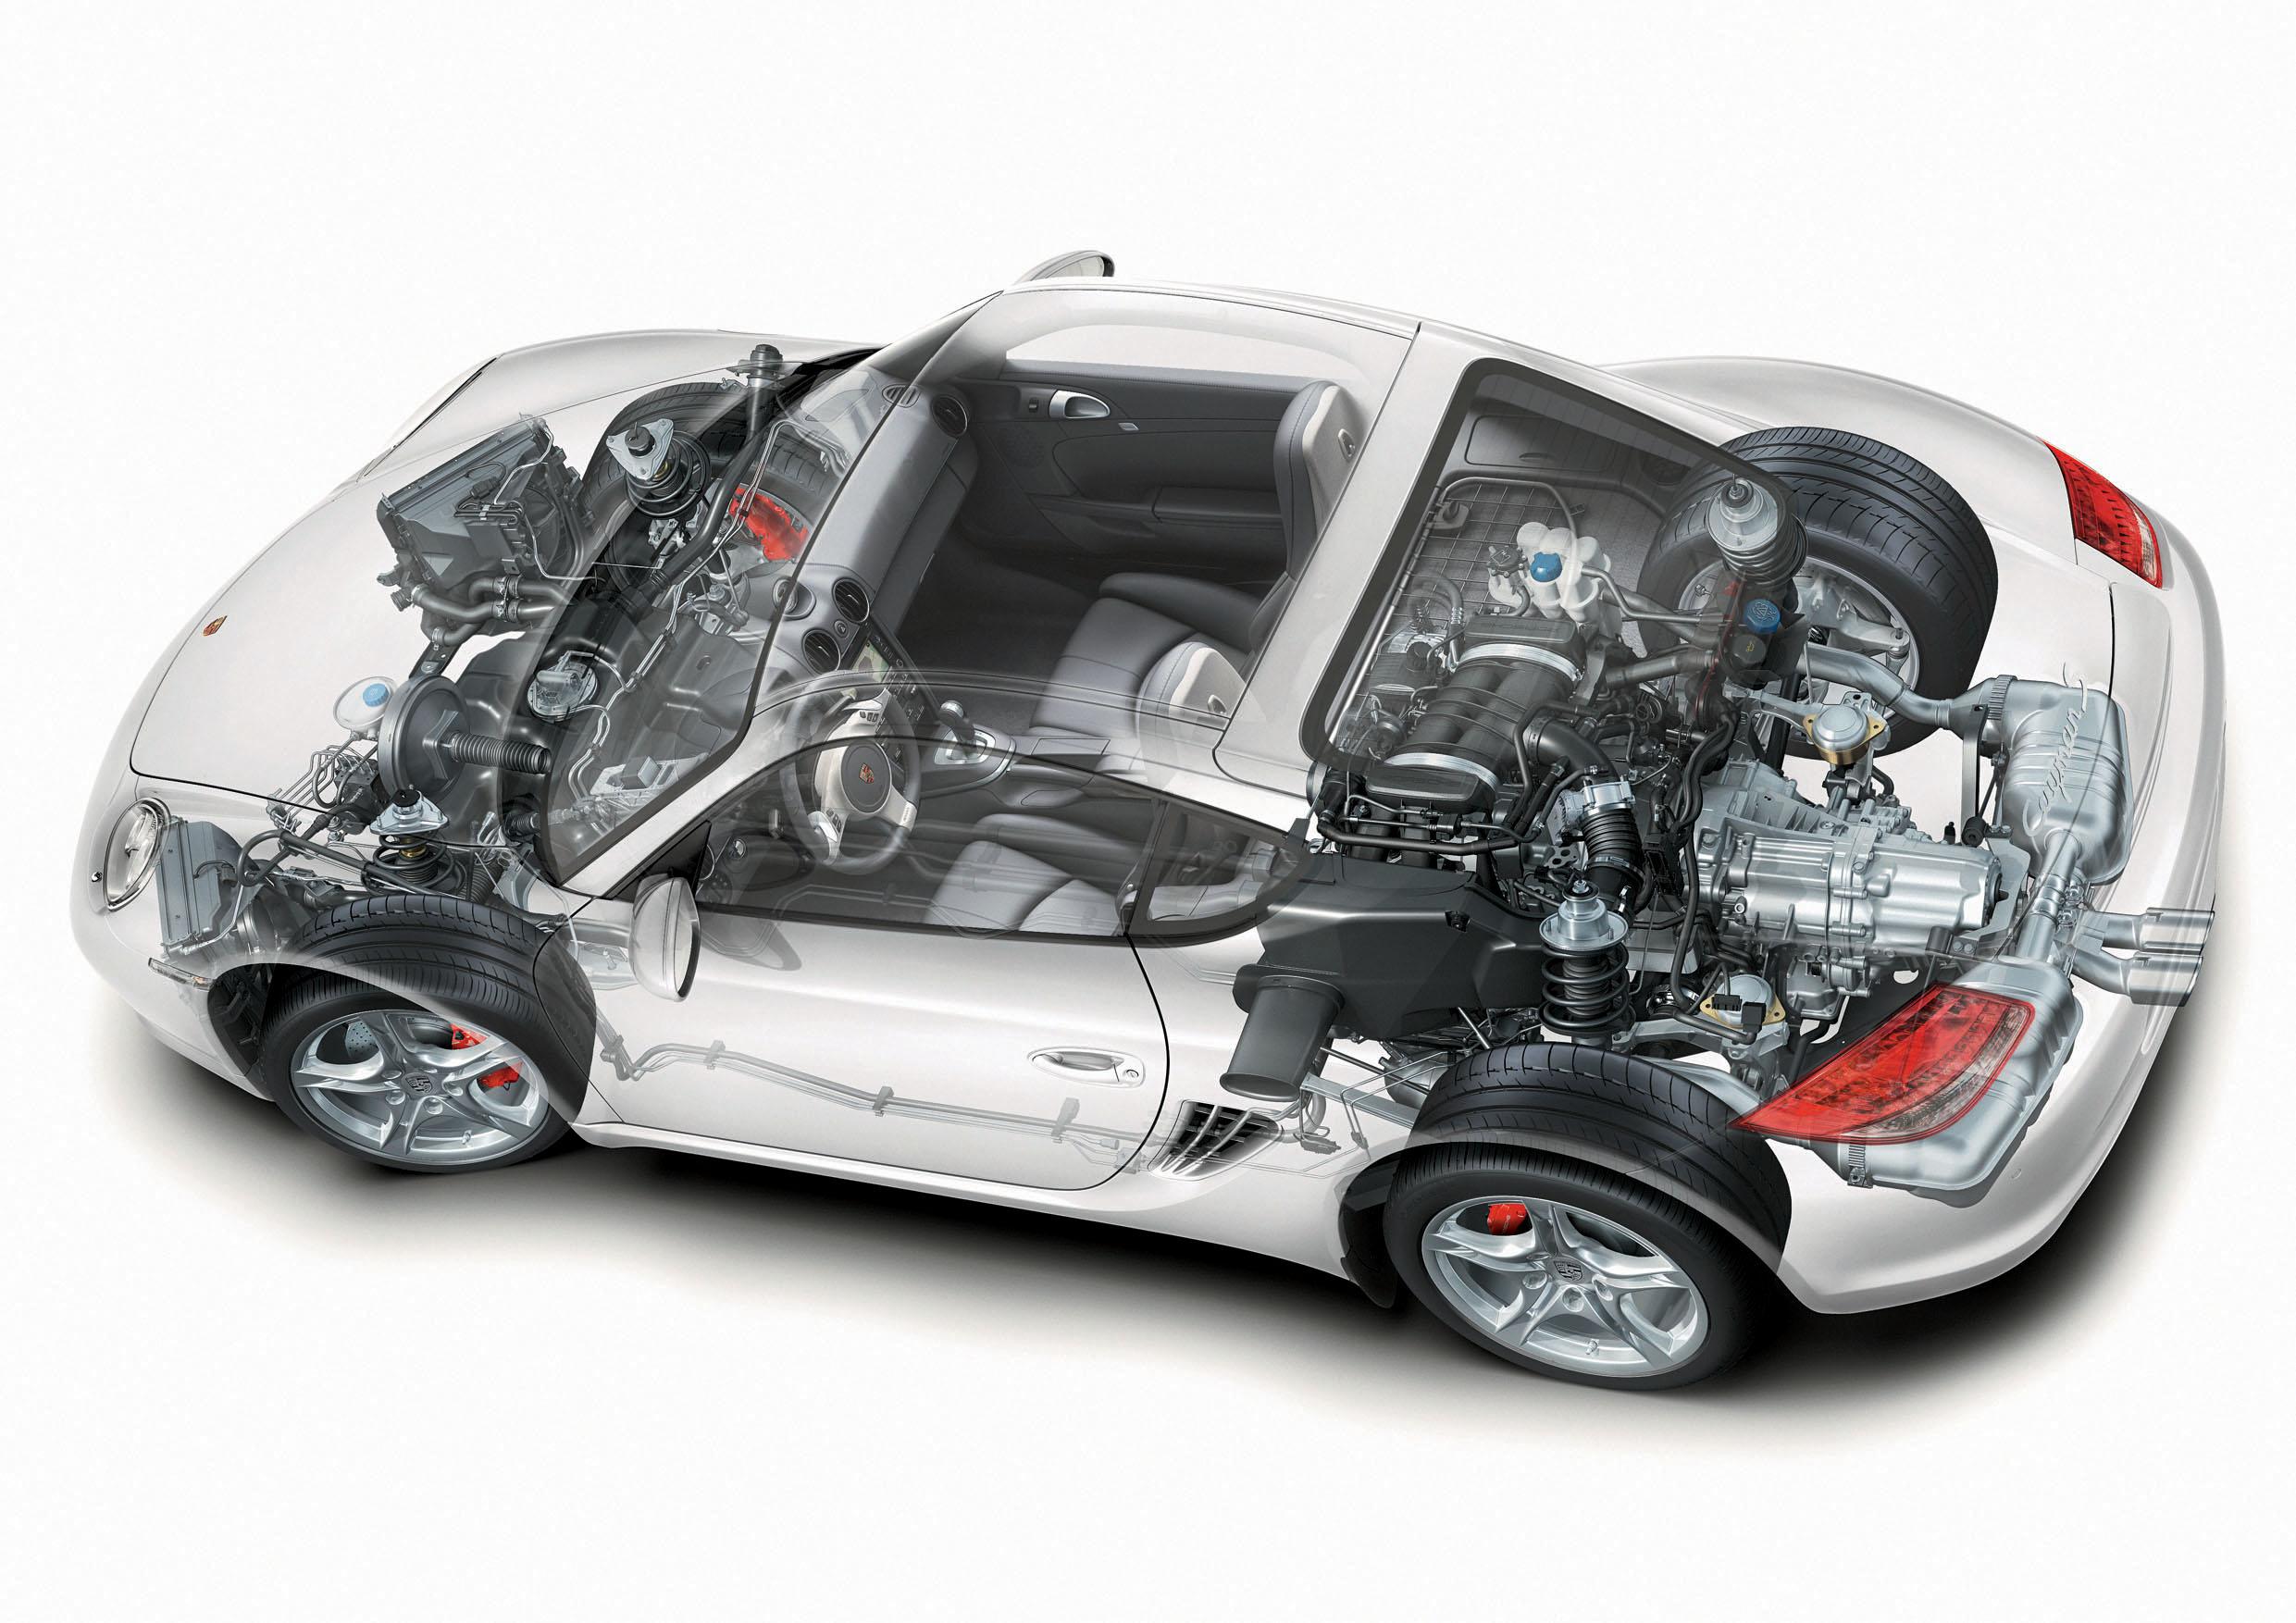 Index Of Upload Medya 2013 Bugatti Veyron Engine Diagram 8 Im